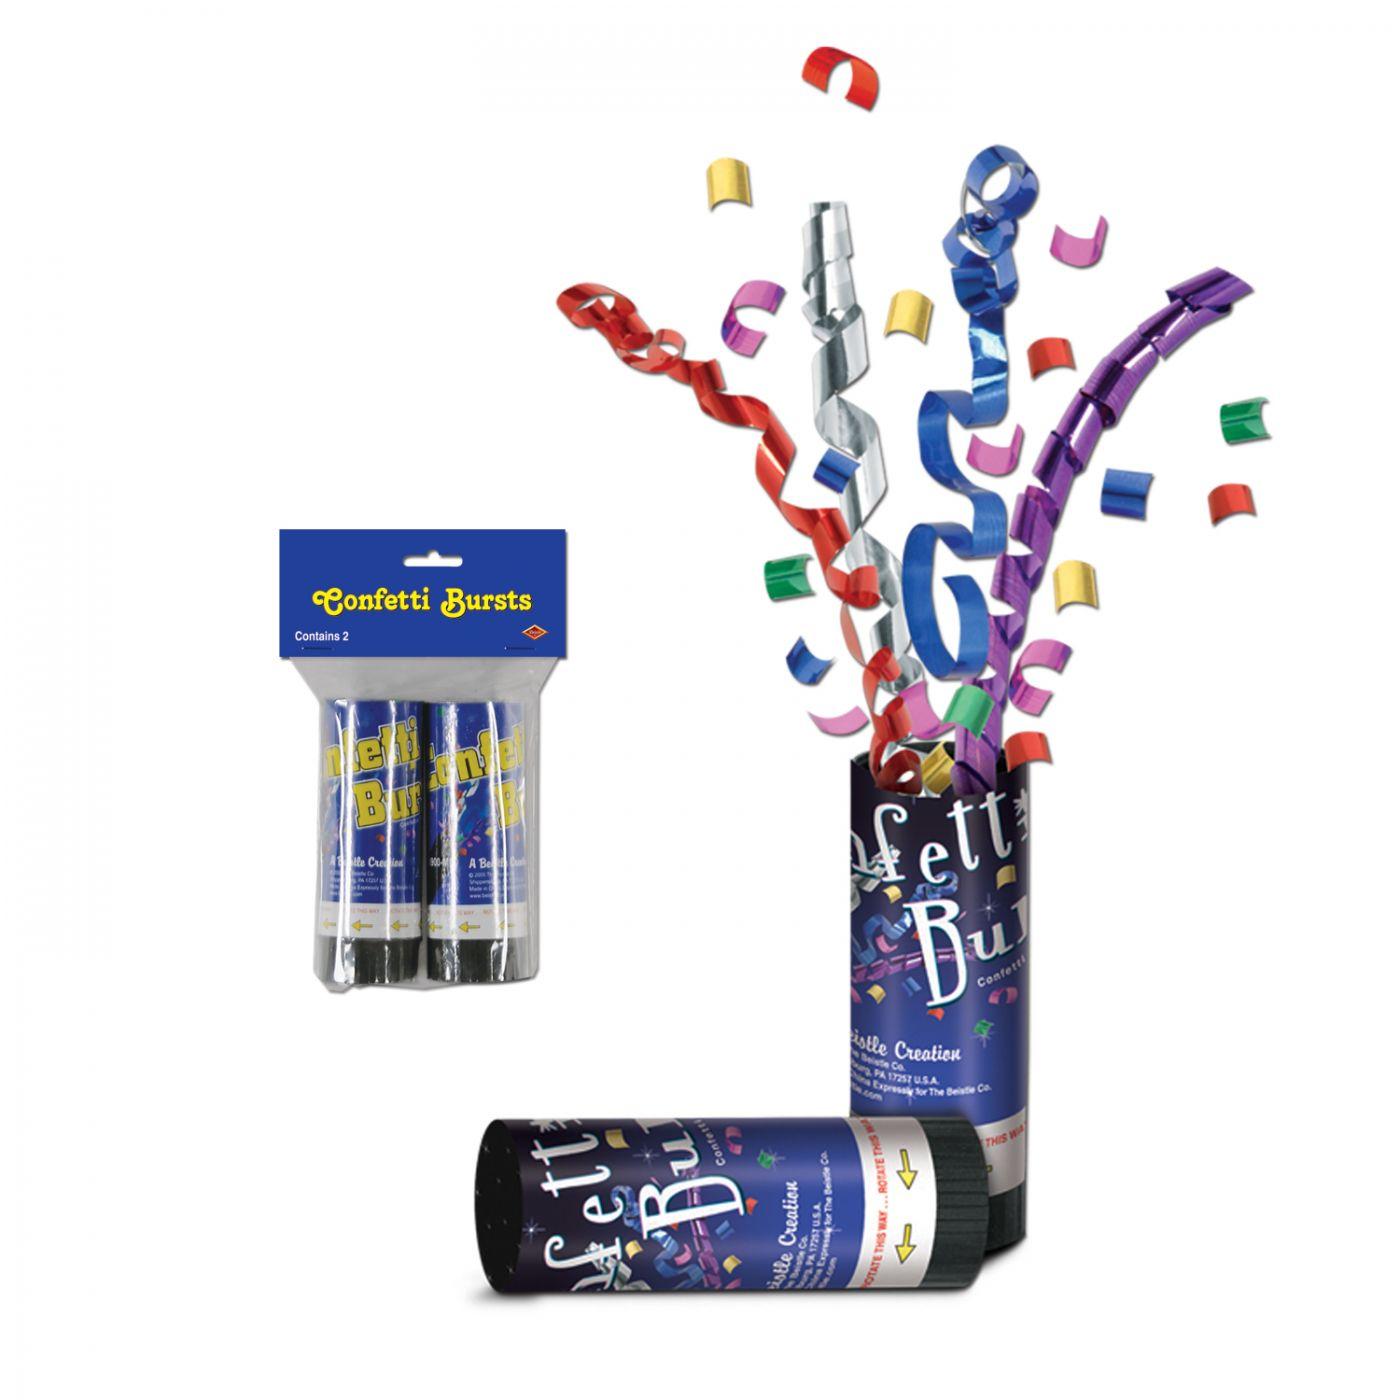 Pkgd Confetti Bursts image